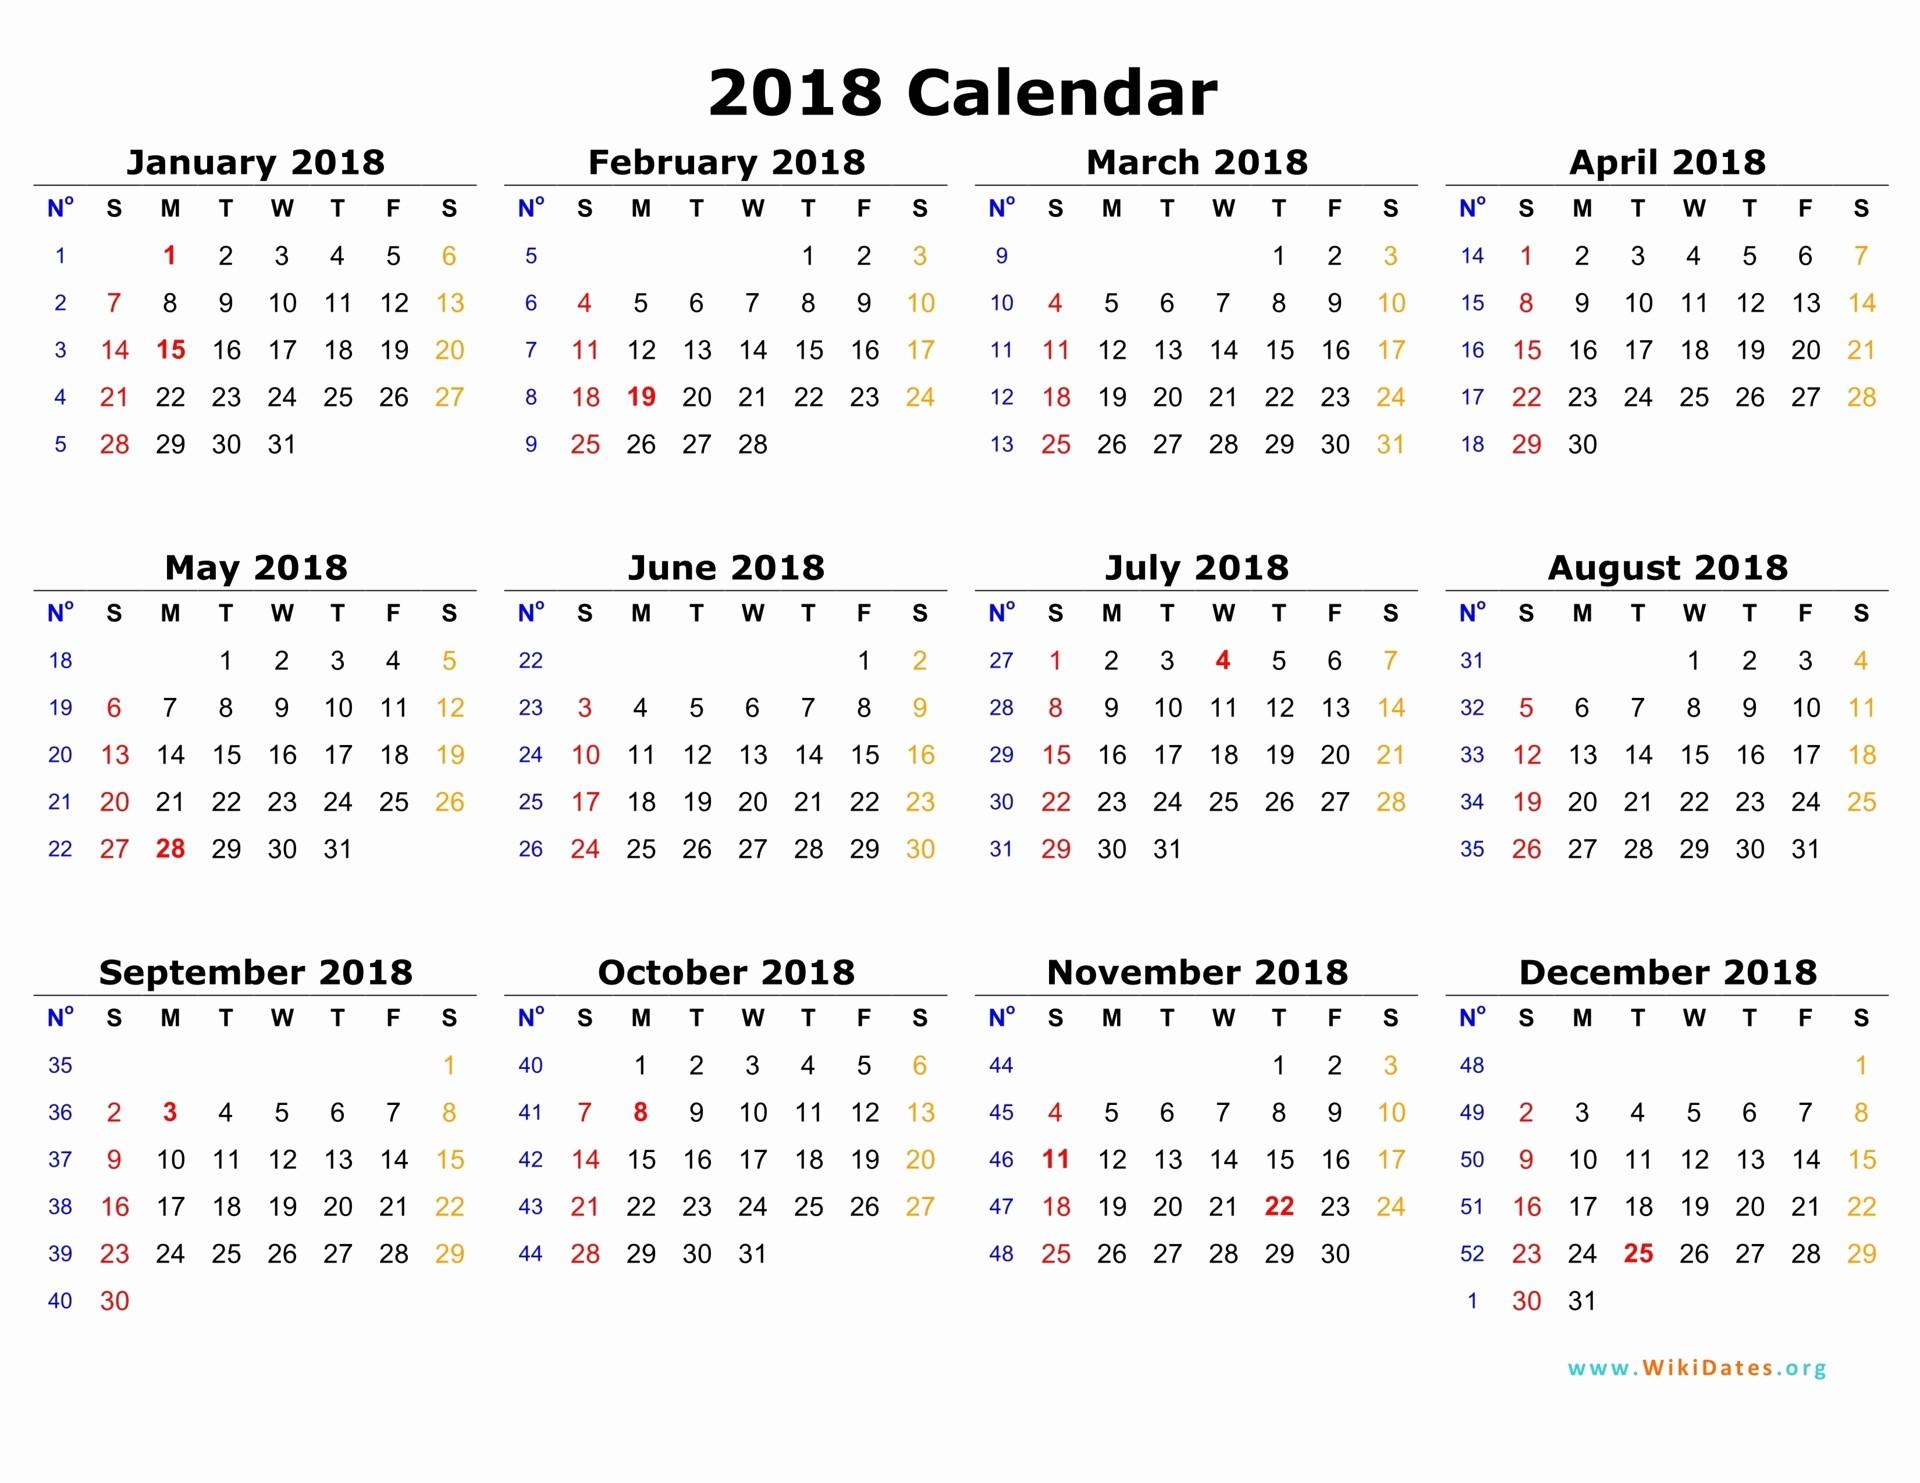 Calendar 2018 Printable with Holidays Inspirational 2018 Calendar